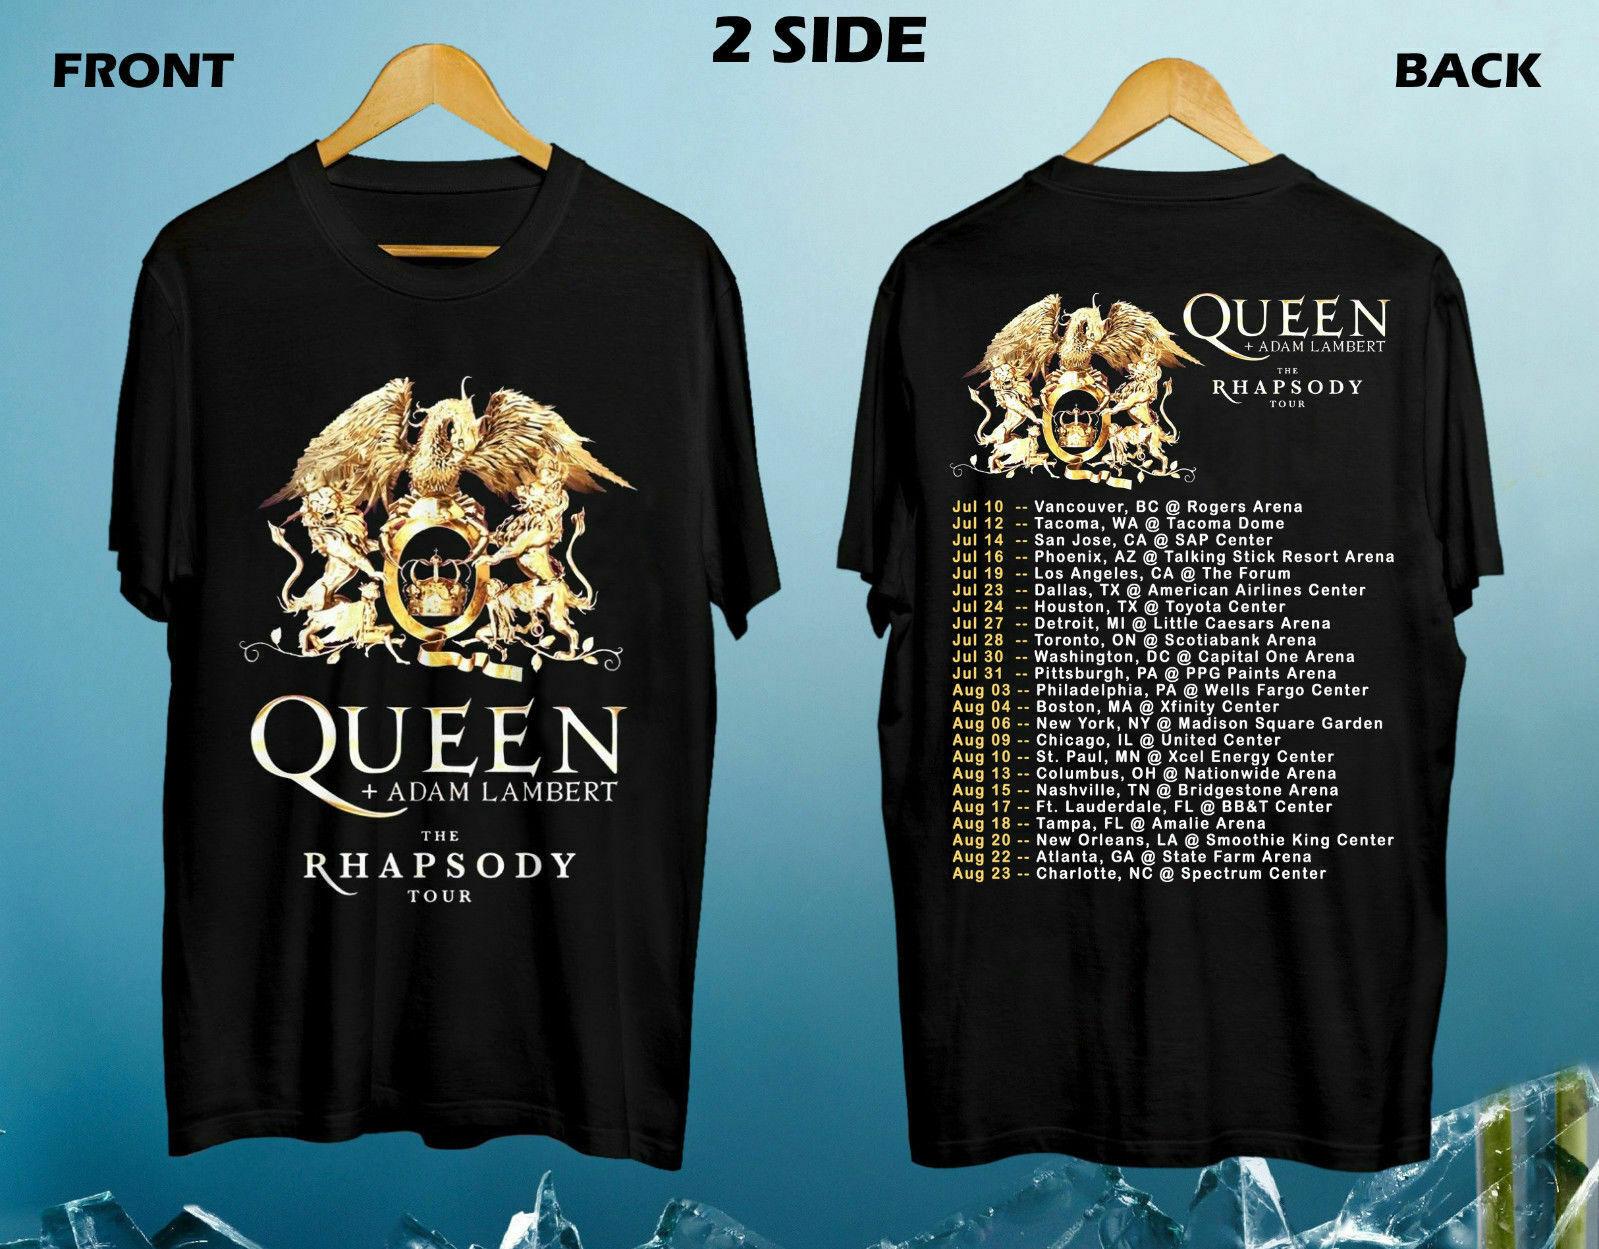 Nueva reina + Adam Lambert la Rhapsody Tour camiseta 2019 North American tamaño S a 3XL camiseta te superior Harajuku de talla grande